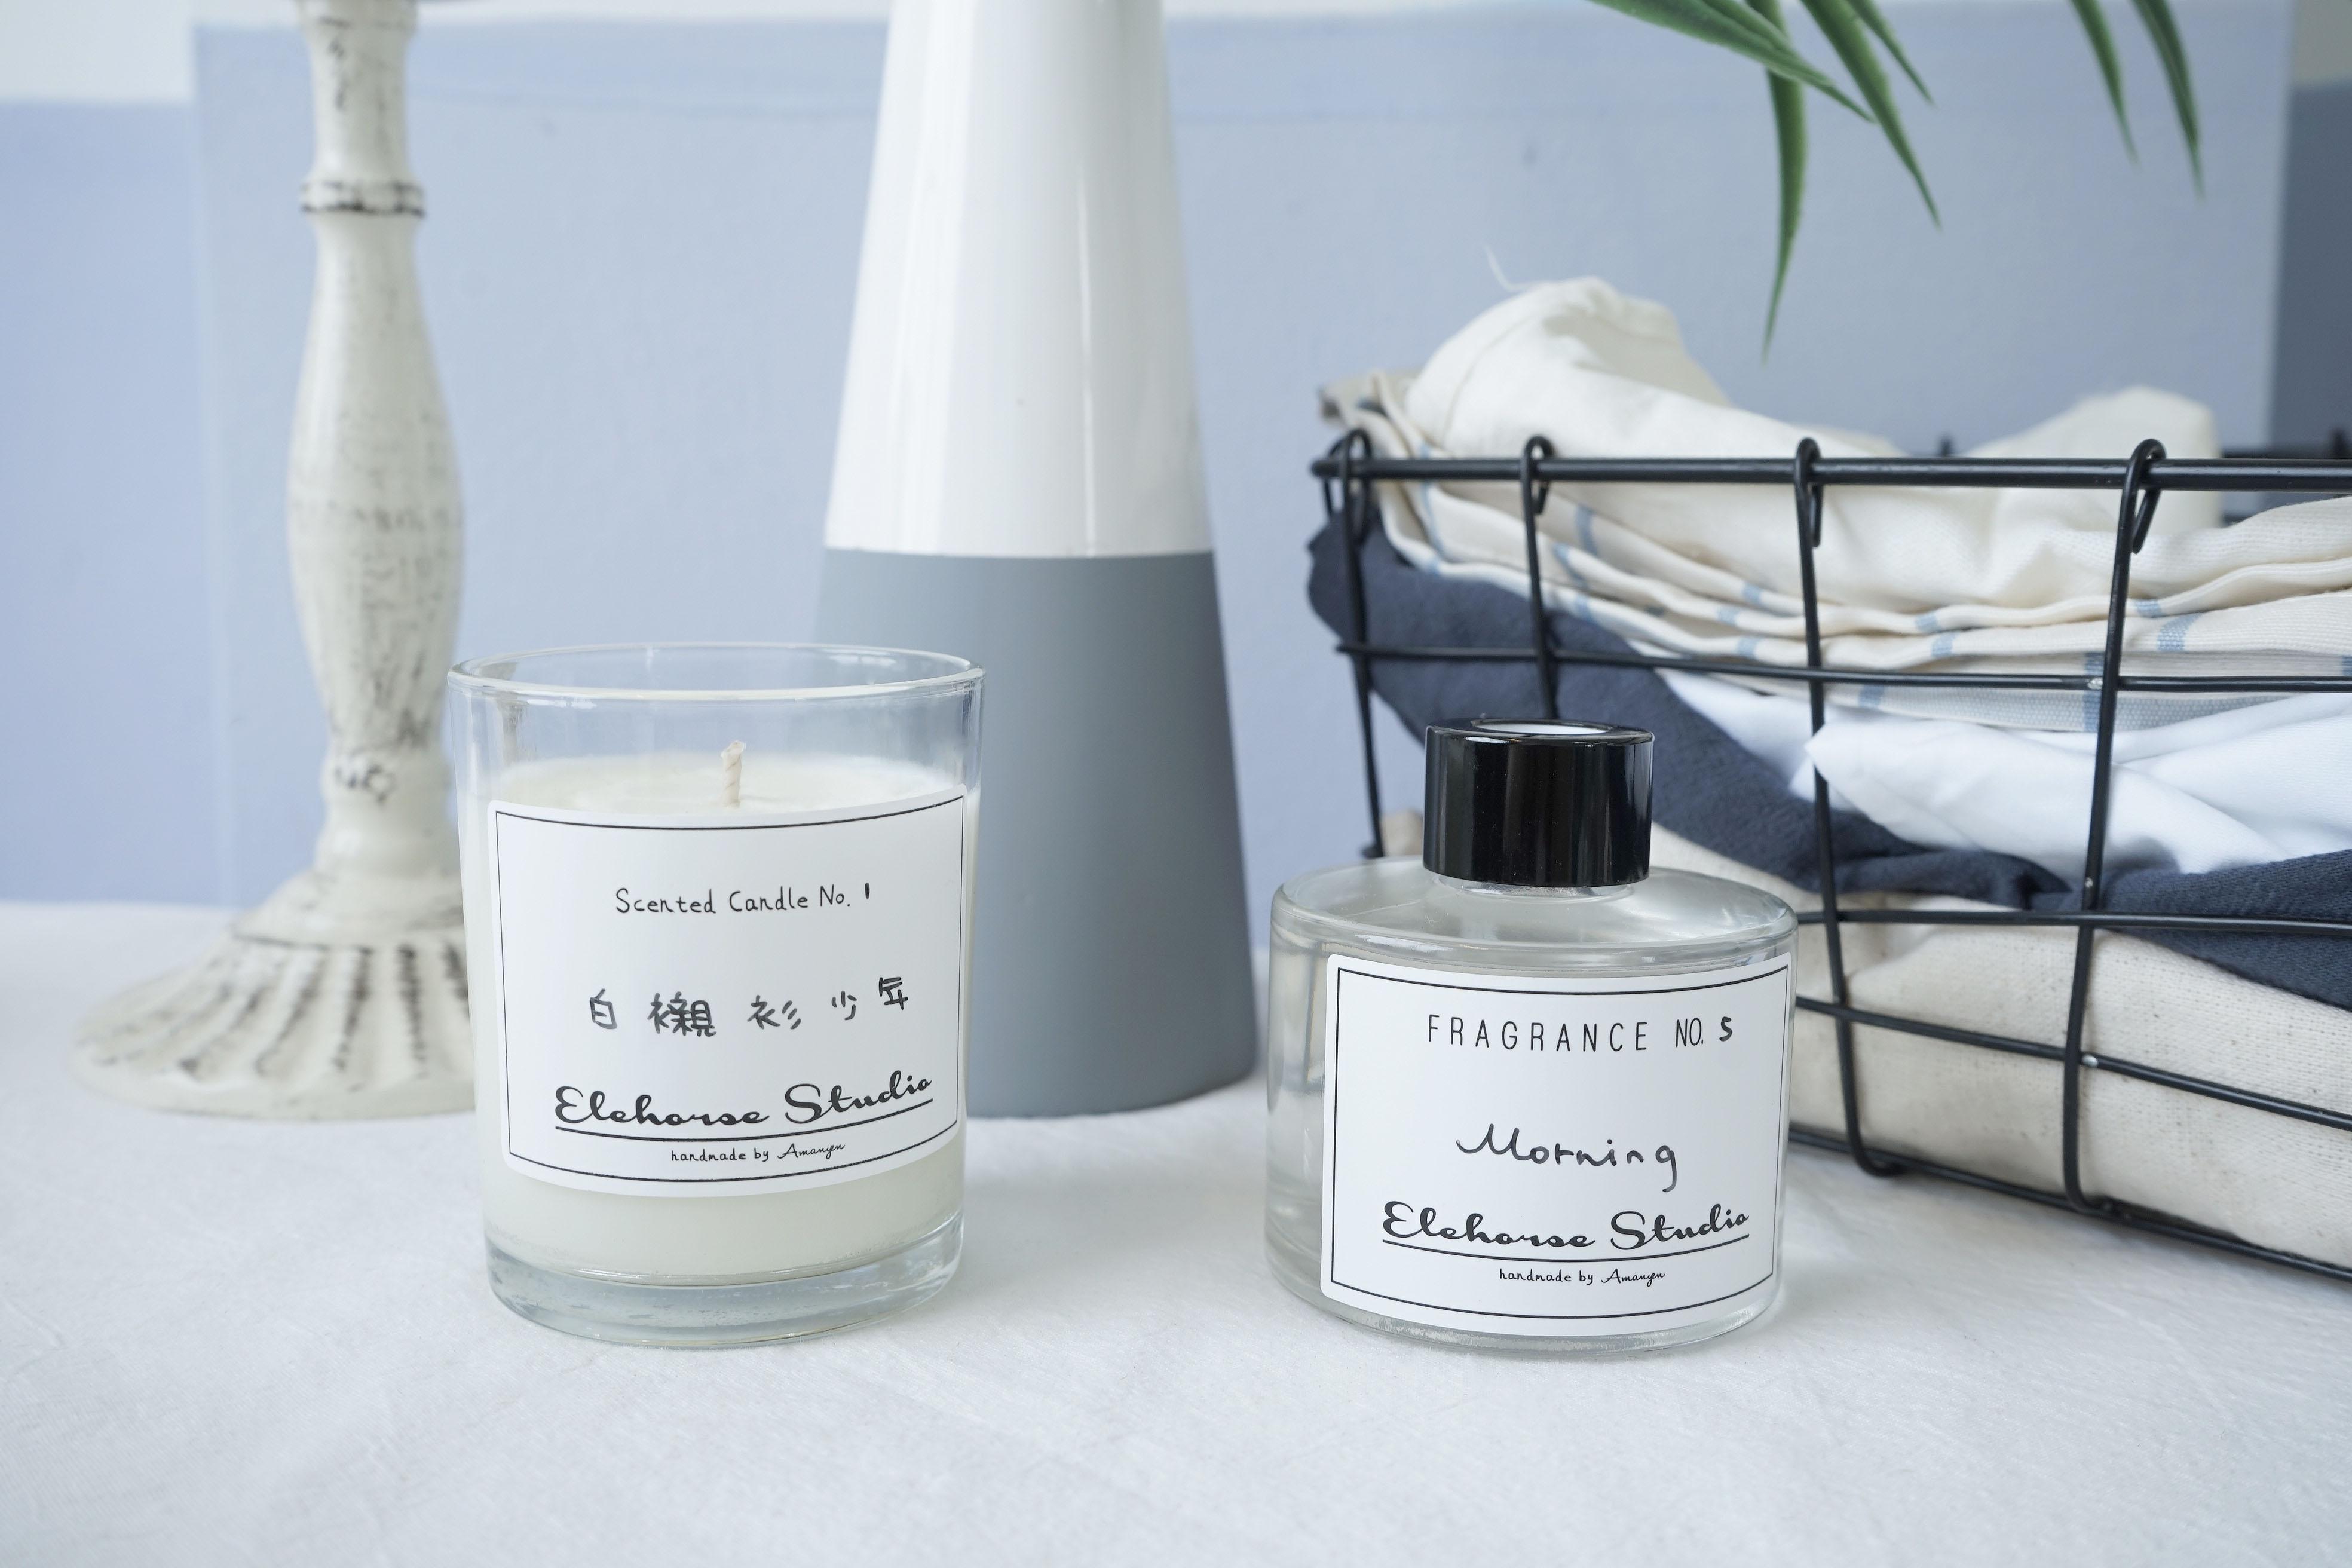 Elehorse Studio 香薰+蜡烛  综合礼盒 GIFT BOX